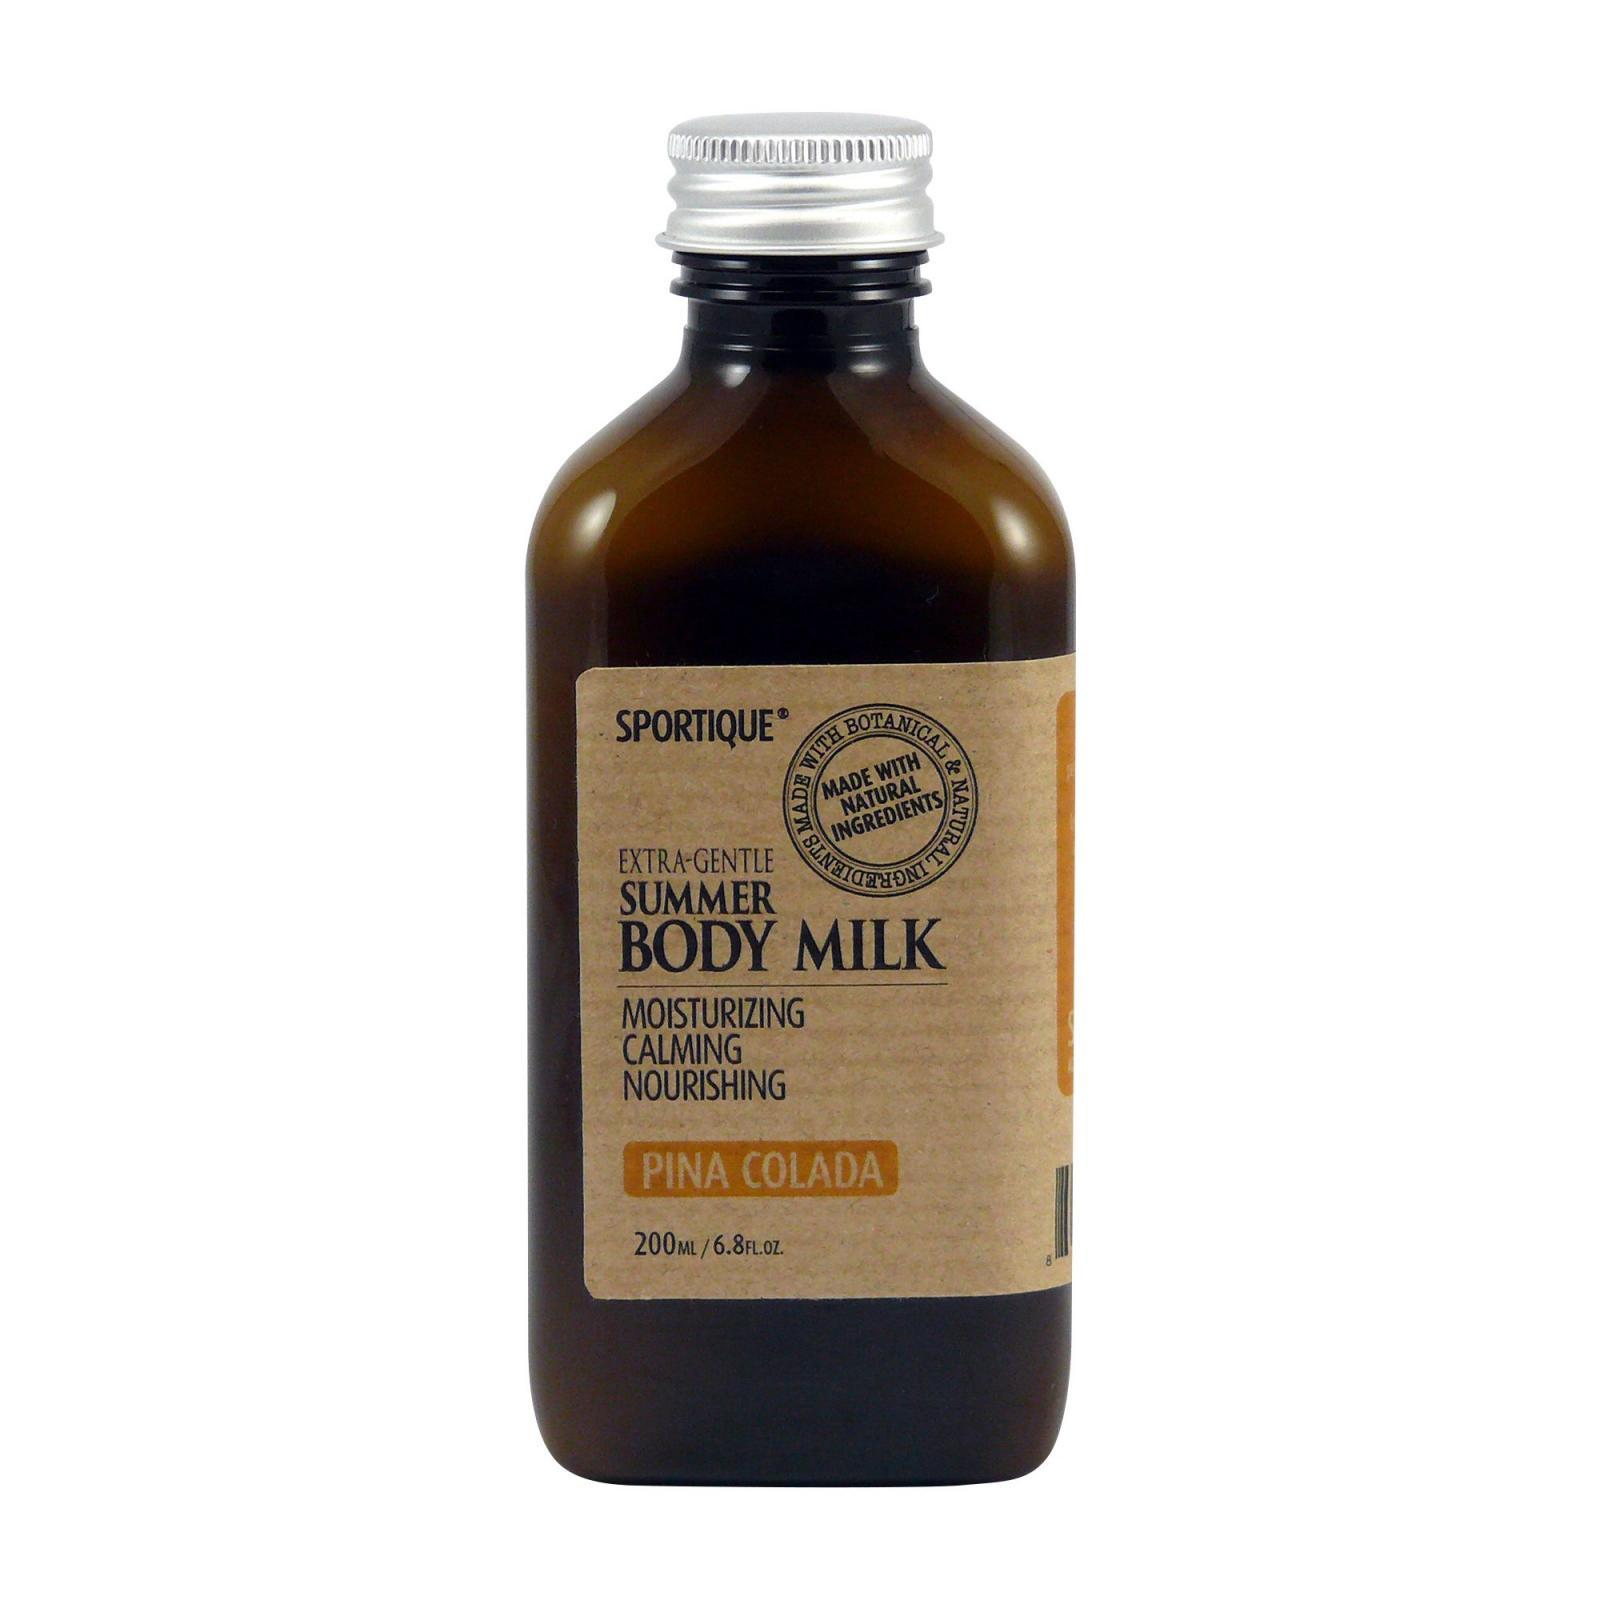 Sportique Tělové mléko Piňa colada 200 ml